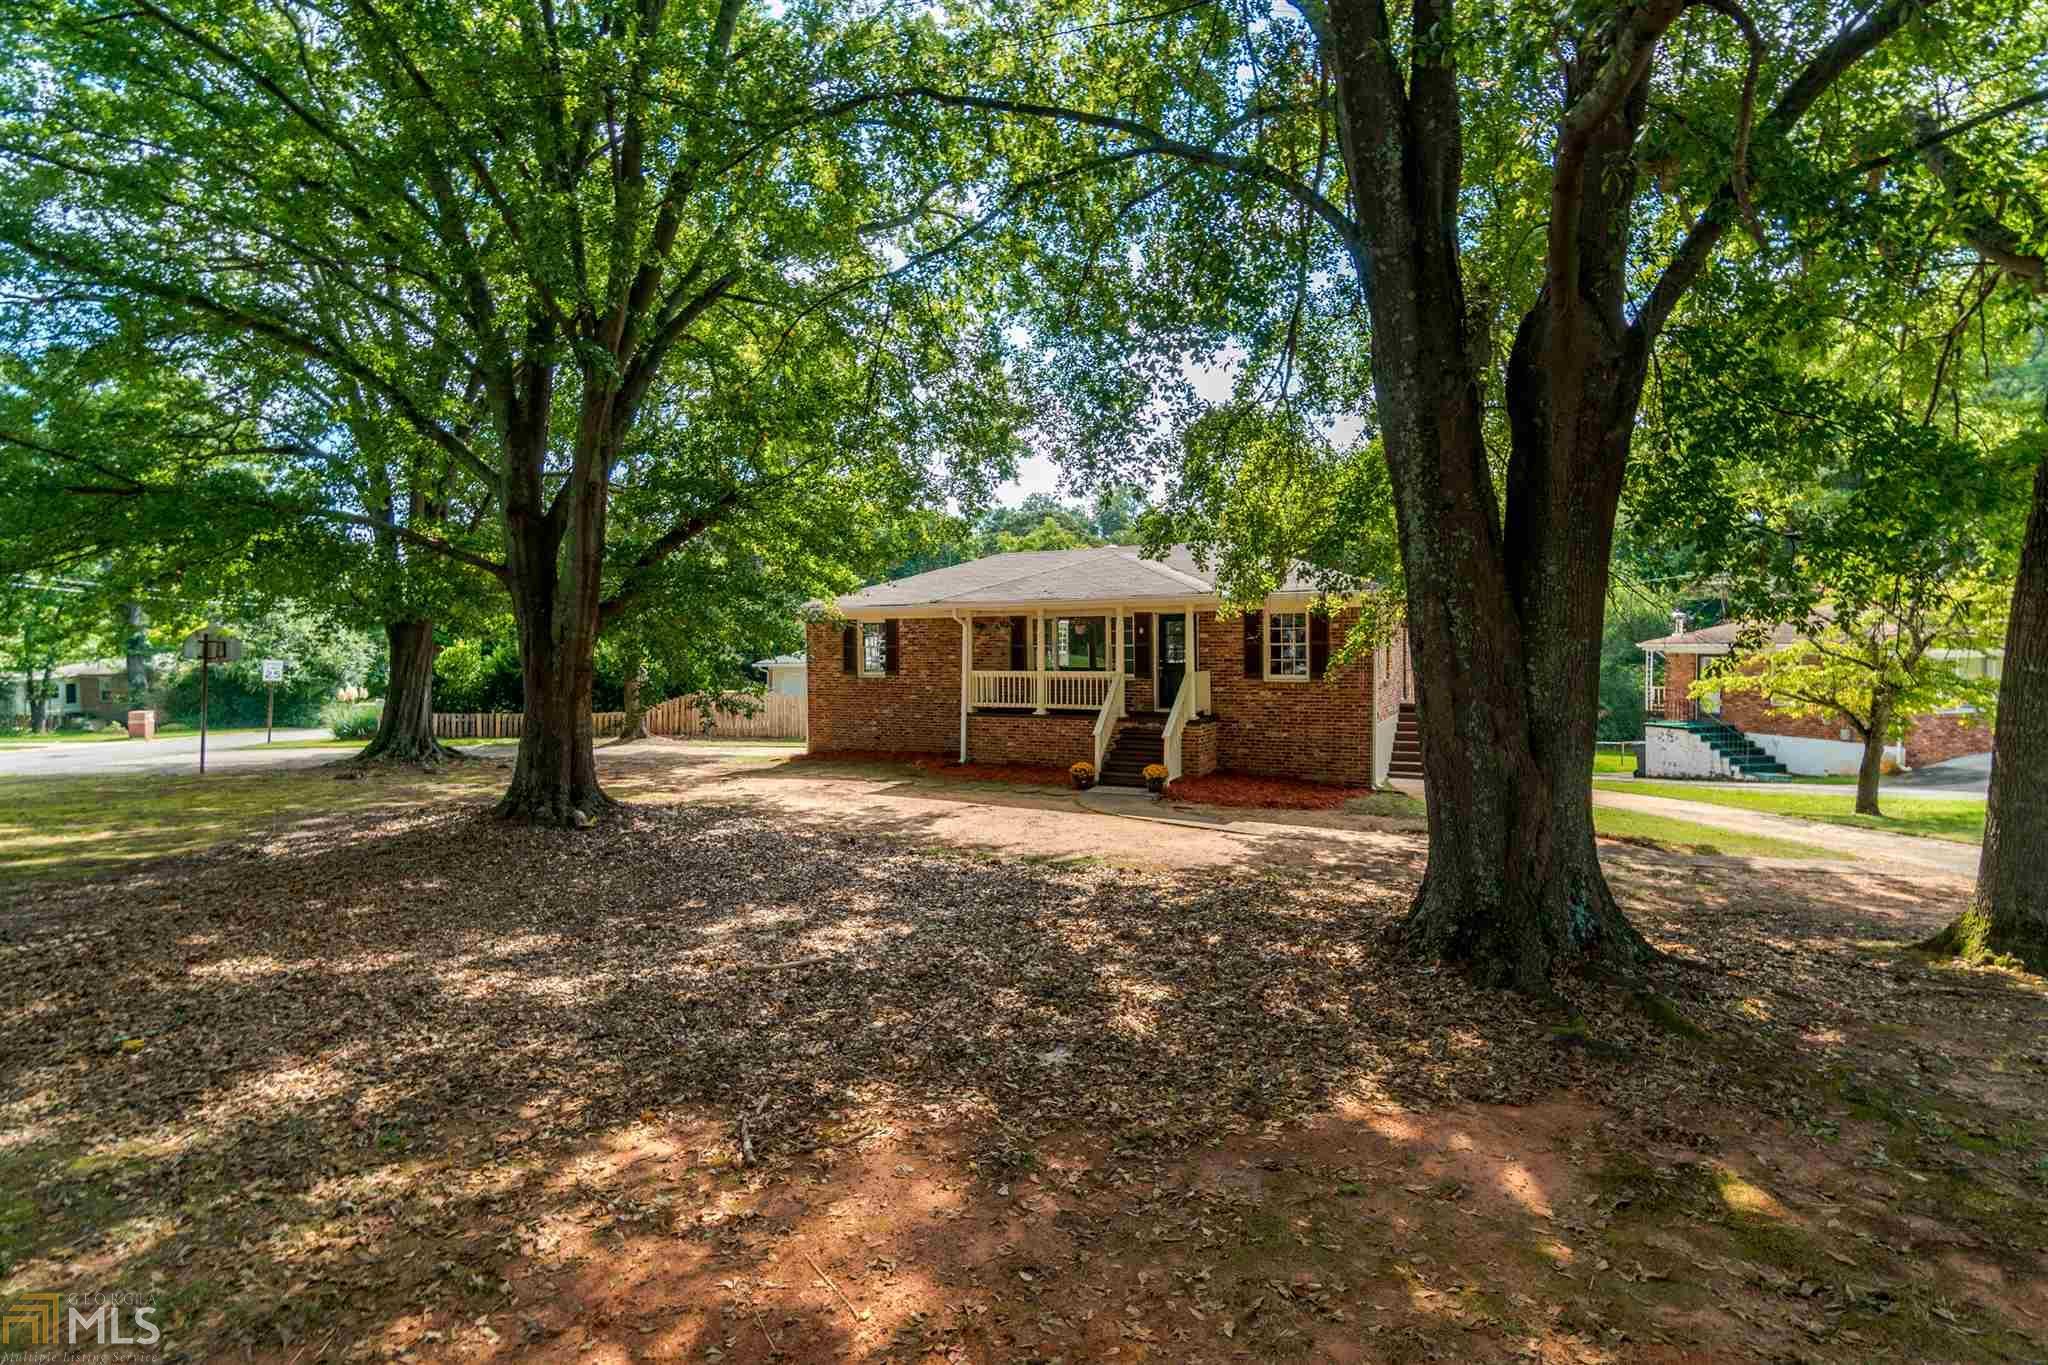 2631 Olive Springs Rd SE, Marietta, GA 30060 - MLS 8445630 ...